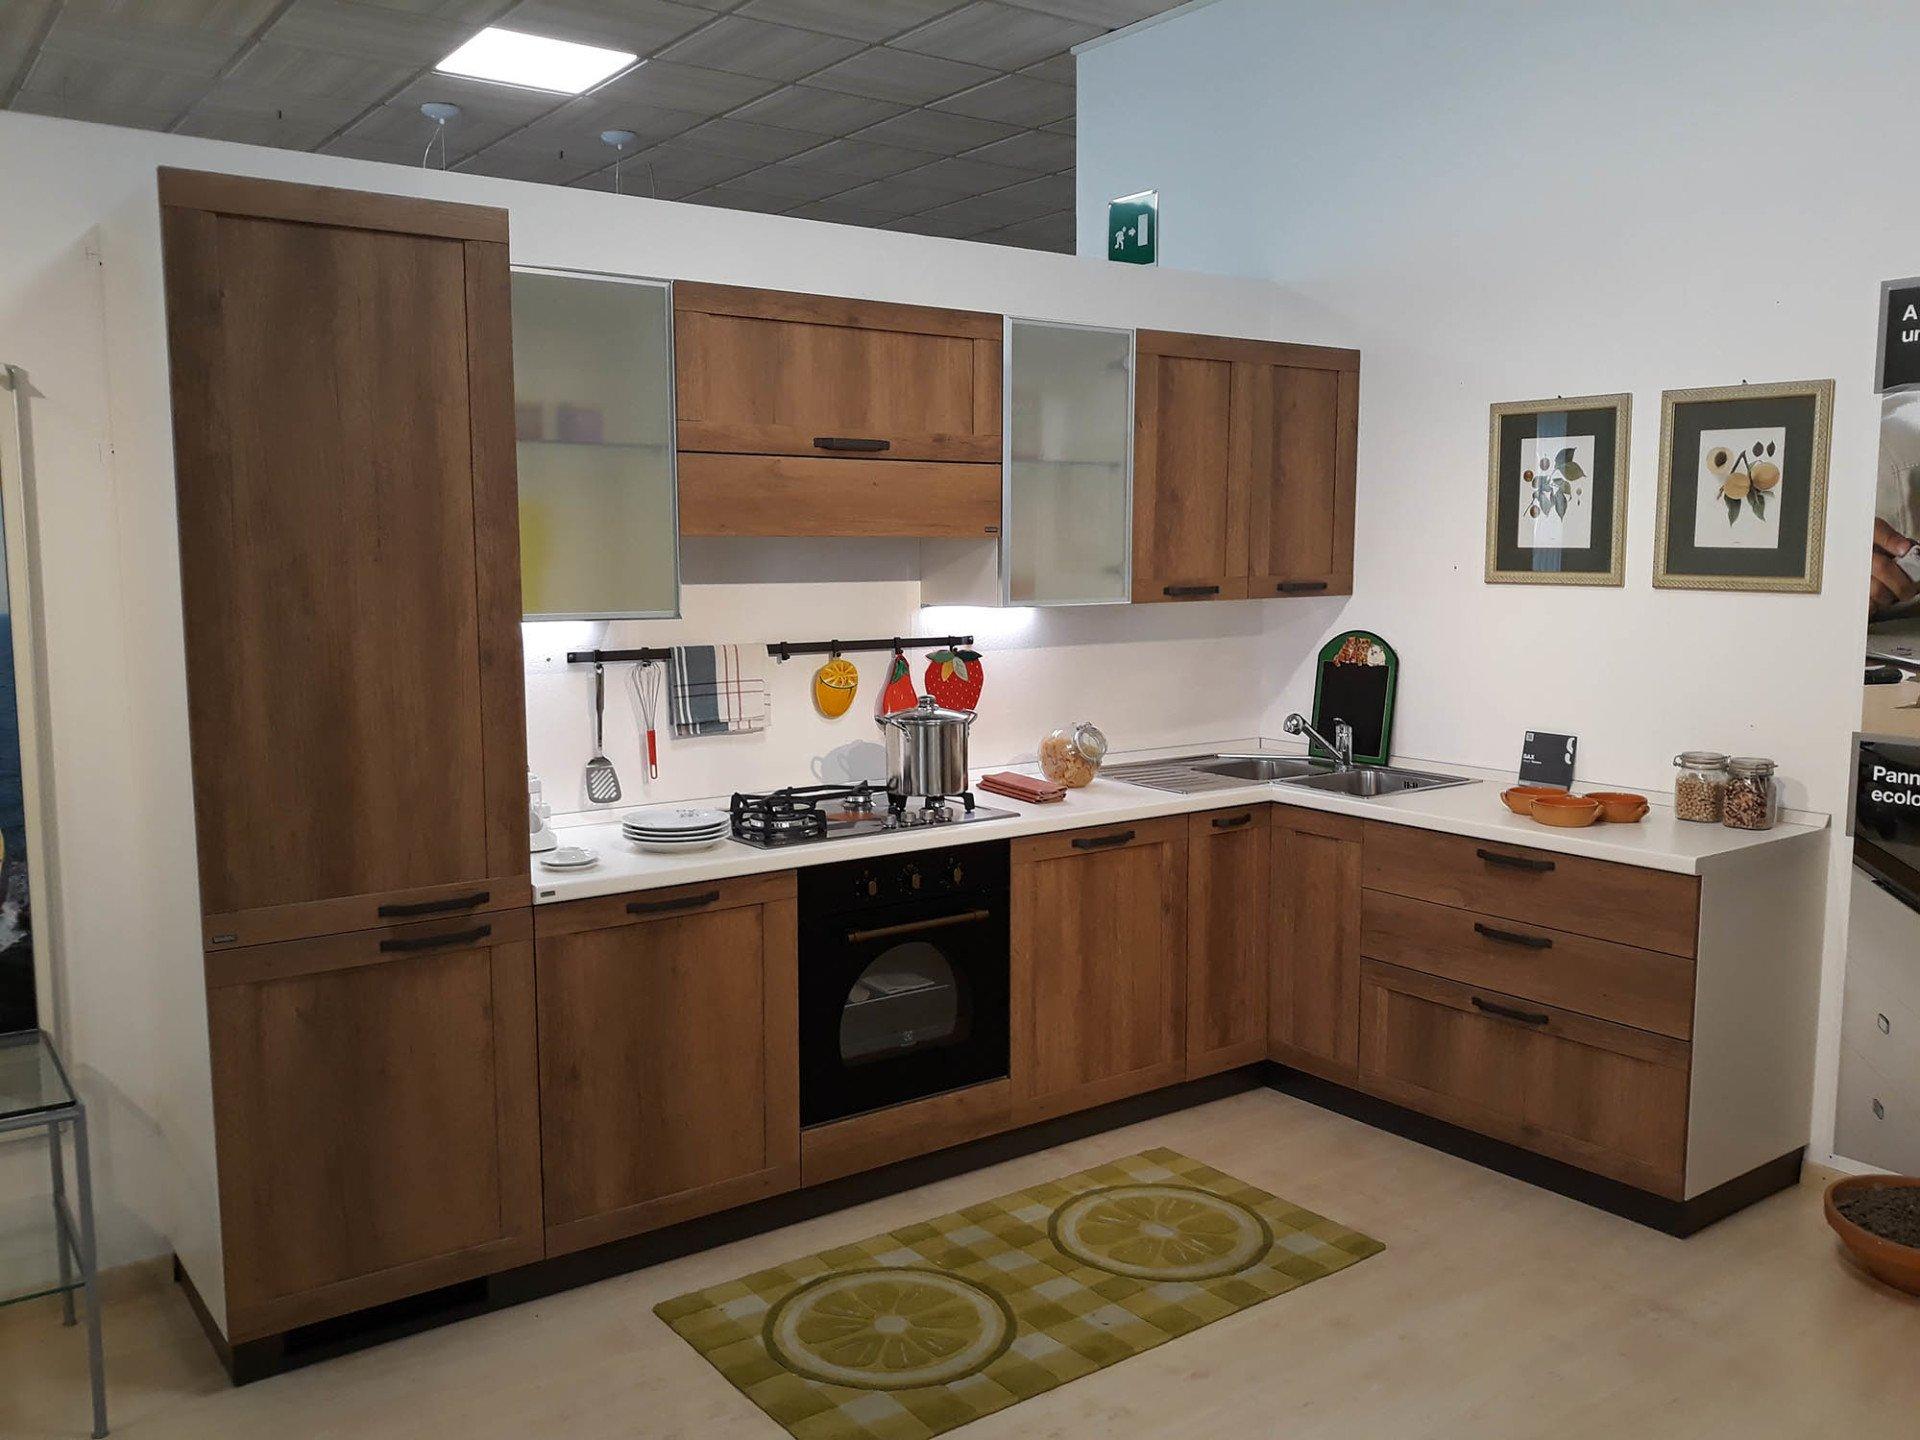 Awesome Cucine Scavolini Sax Gallery - Home Design - joygree.info